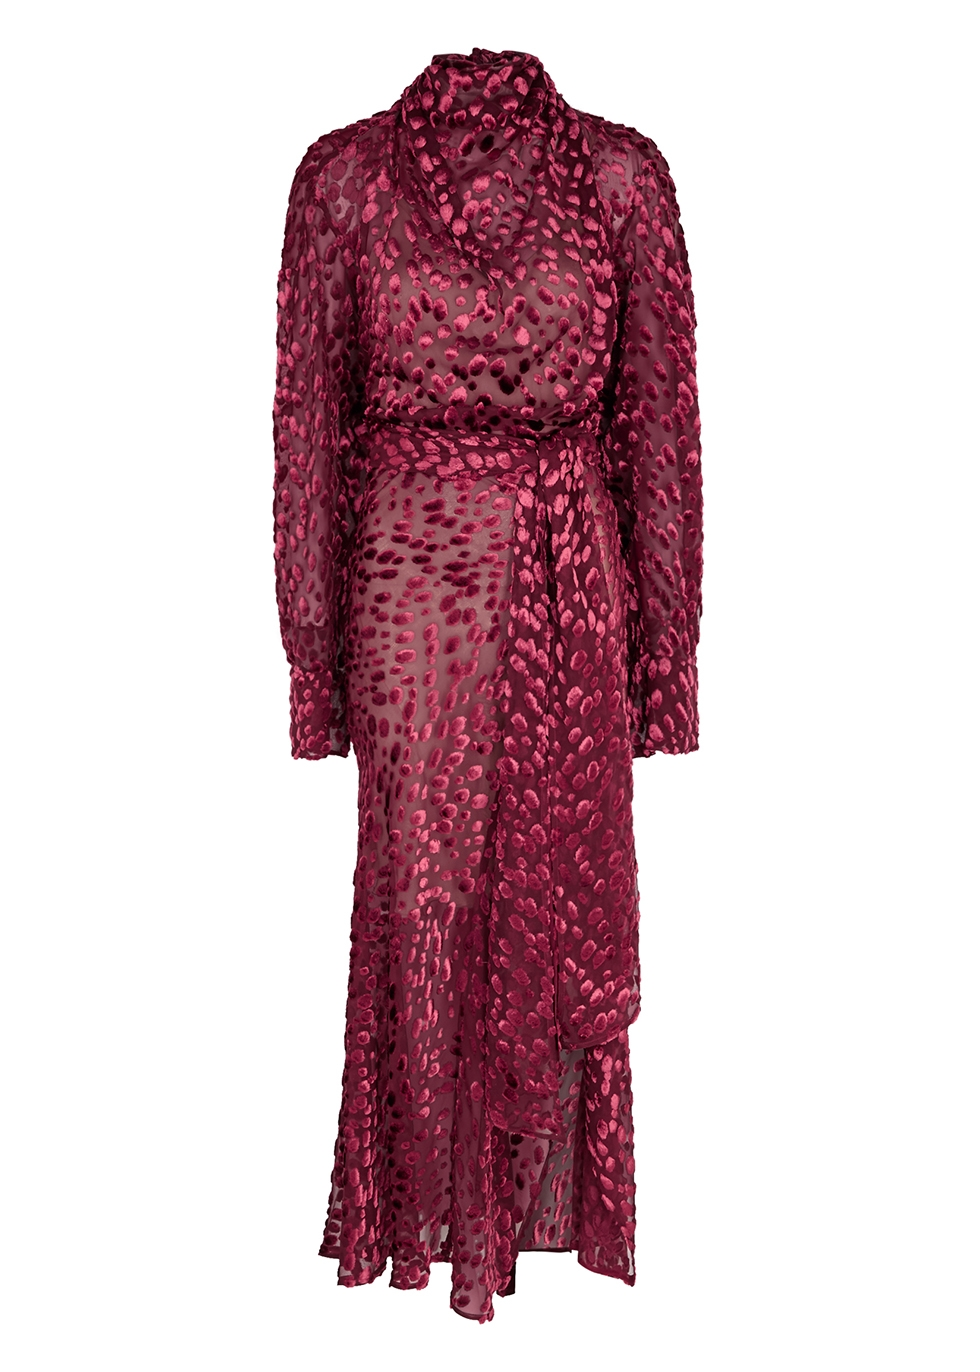 Aurel dark red draped devoré dress